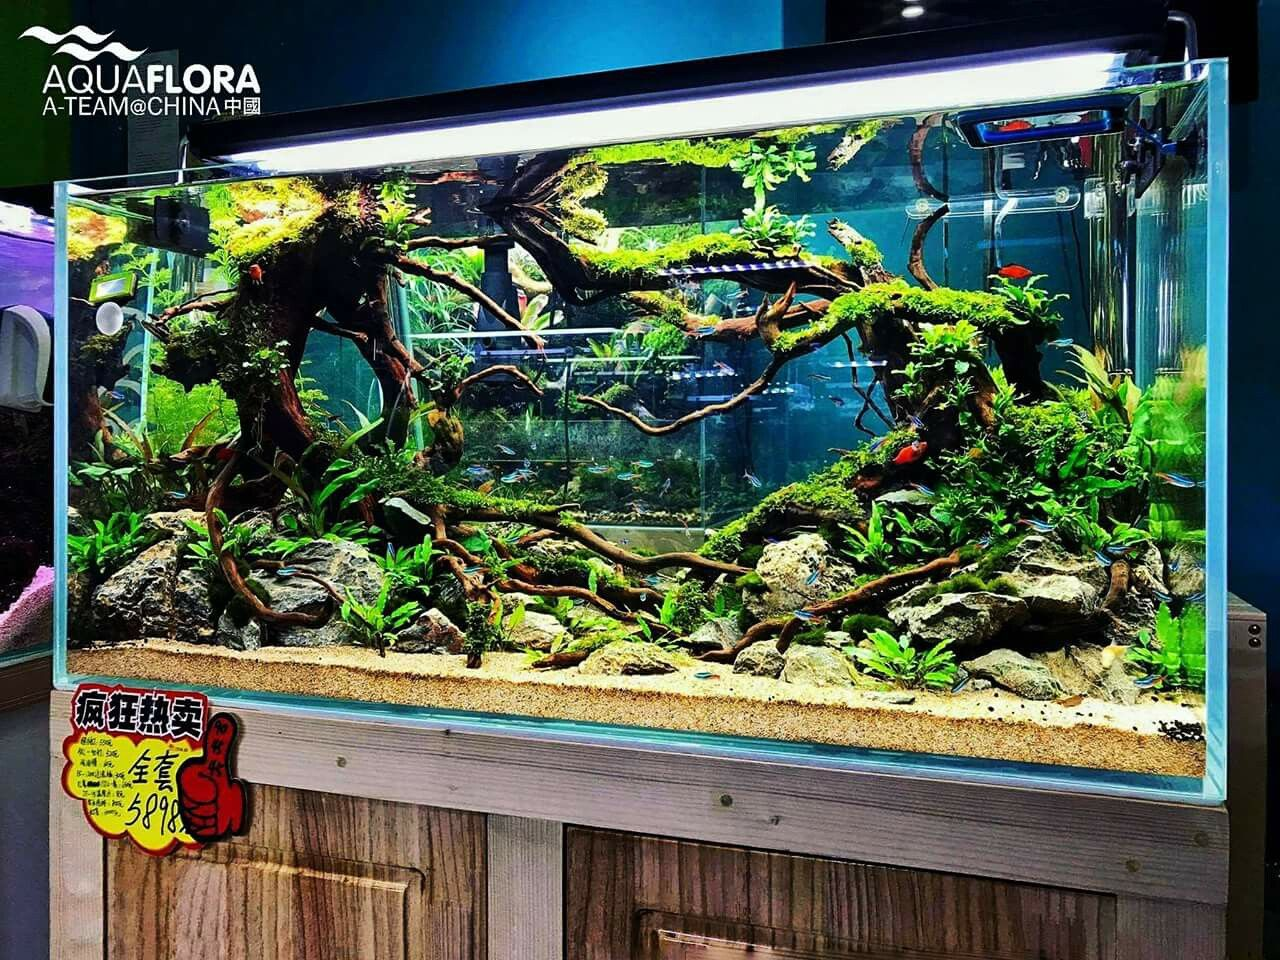 Inspiring Aquascape At Guangzhou Market In China Aquaflora